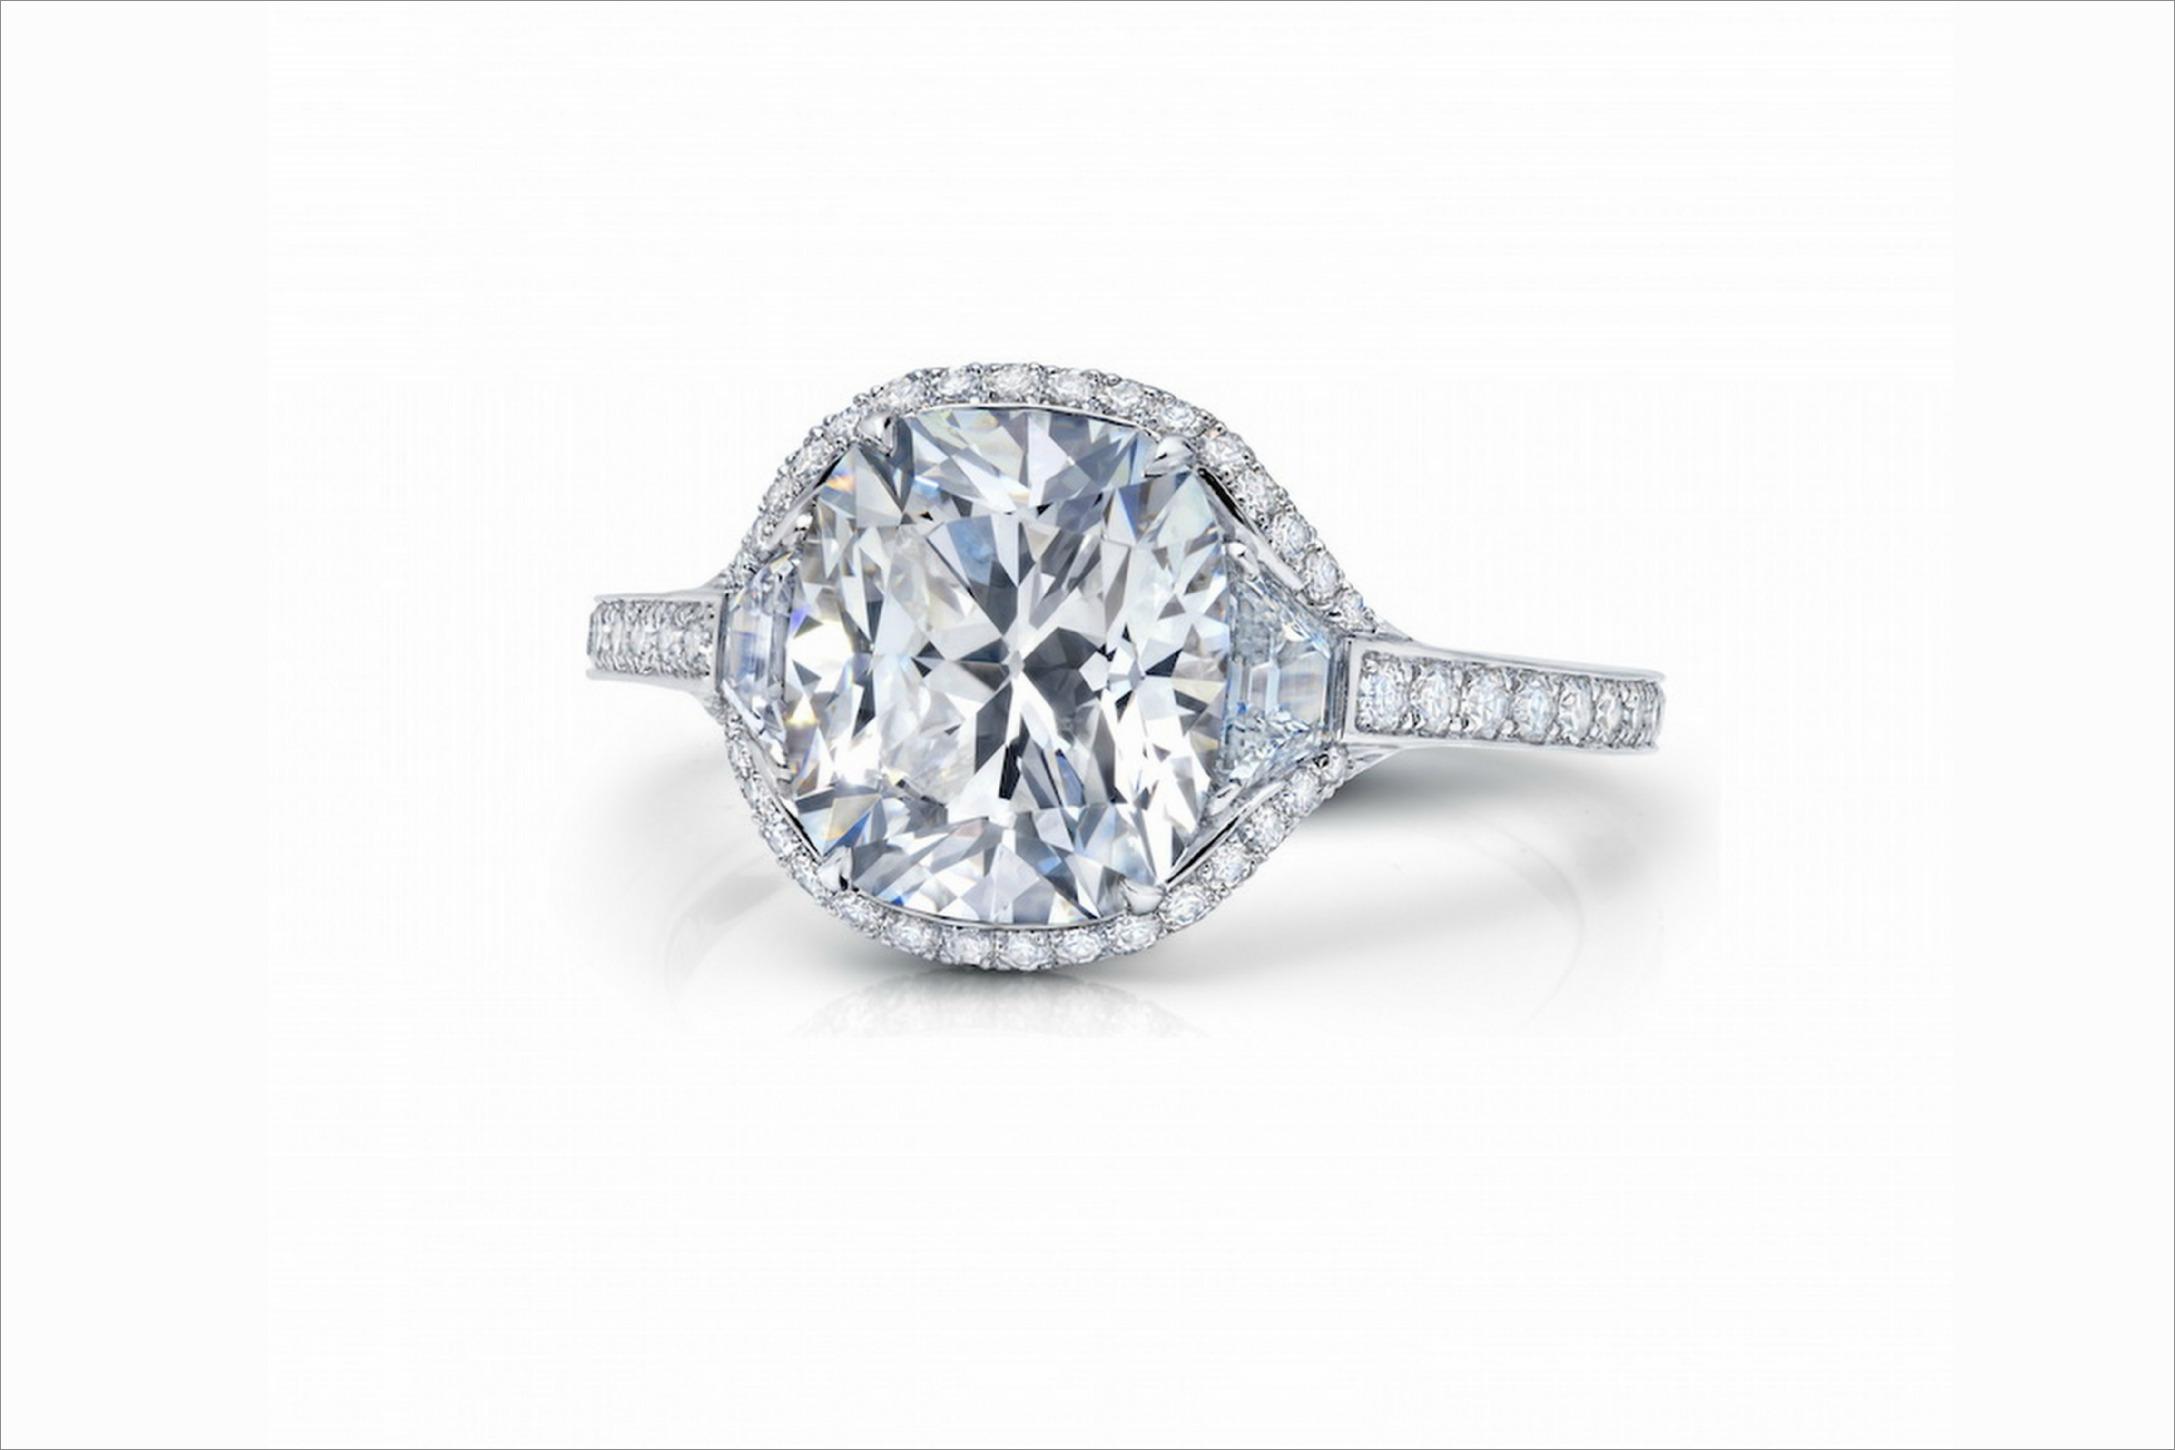 Palace Engagement Ring by Martin Katz